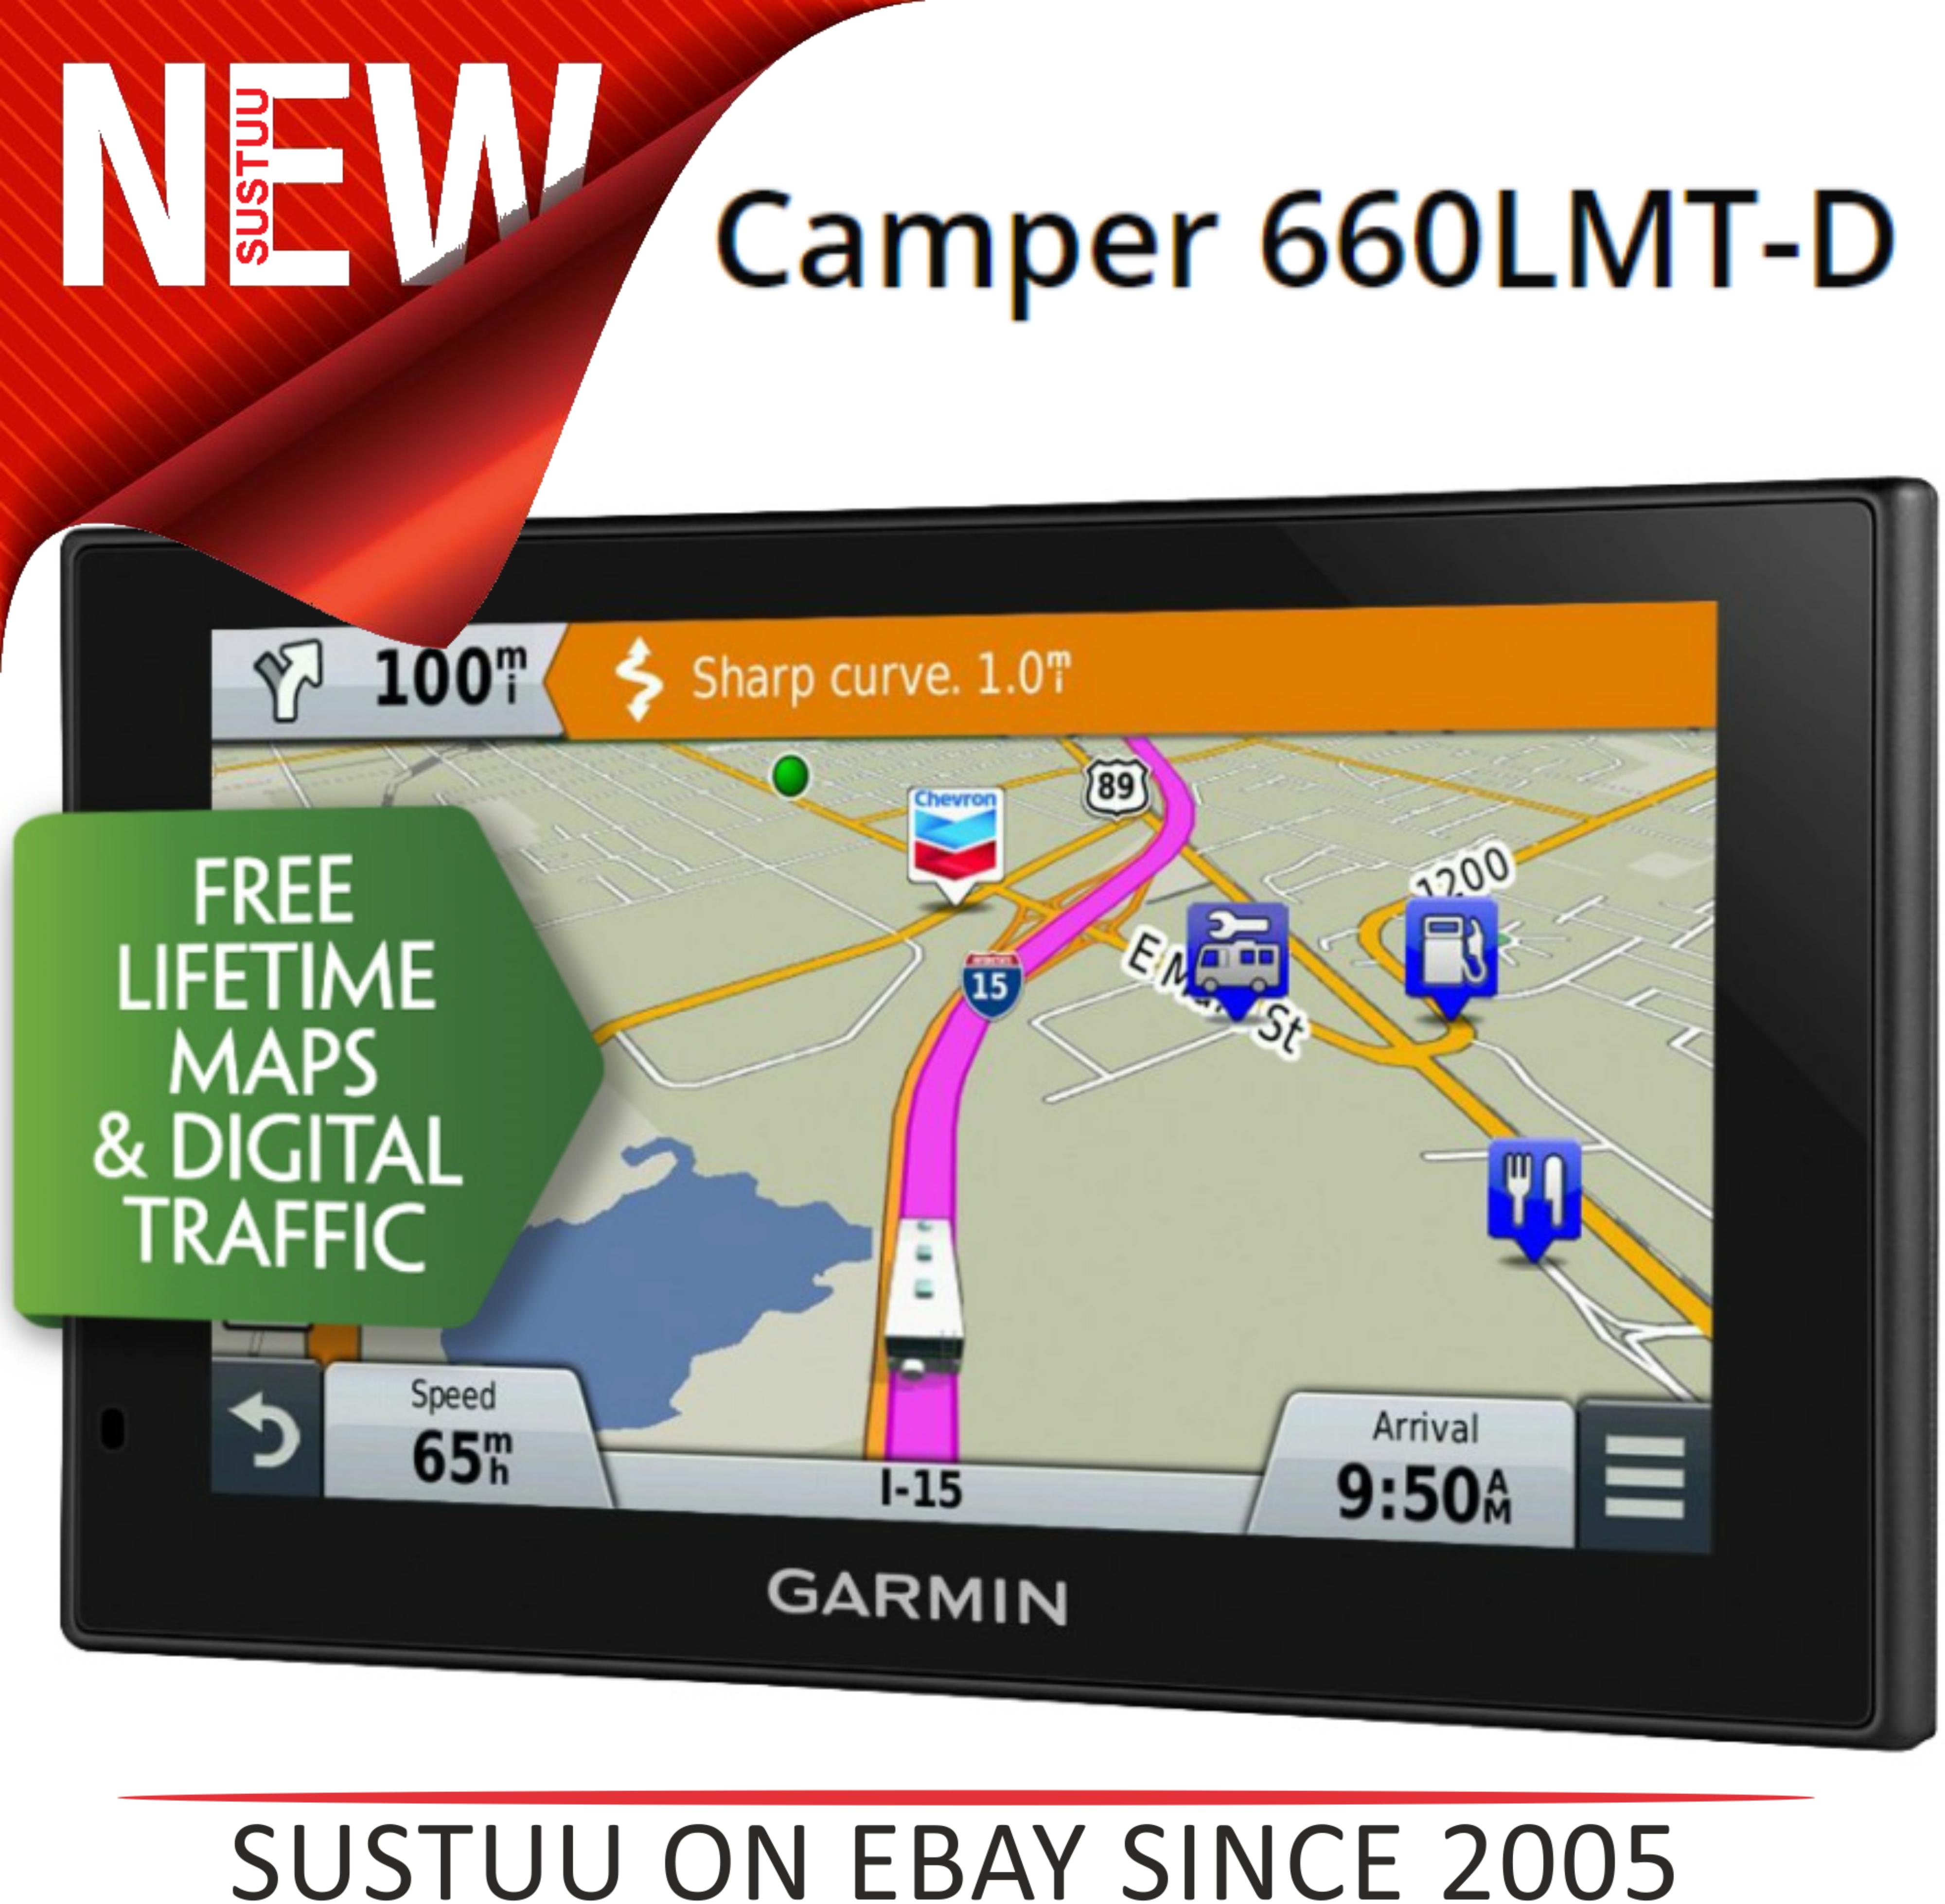 NEW Garmin Camper 660LMT-D Motorhome Caravan GPS SATNAV Lifetime Maps & Traffic